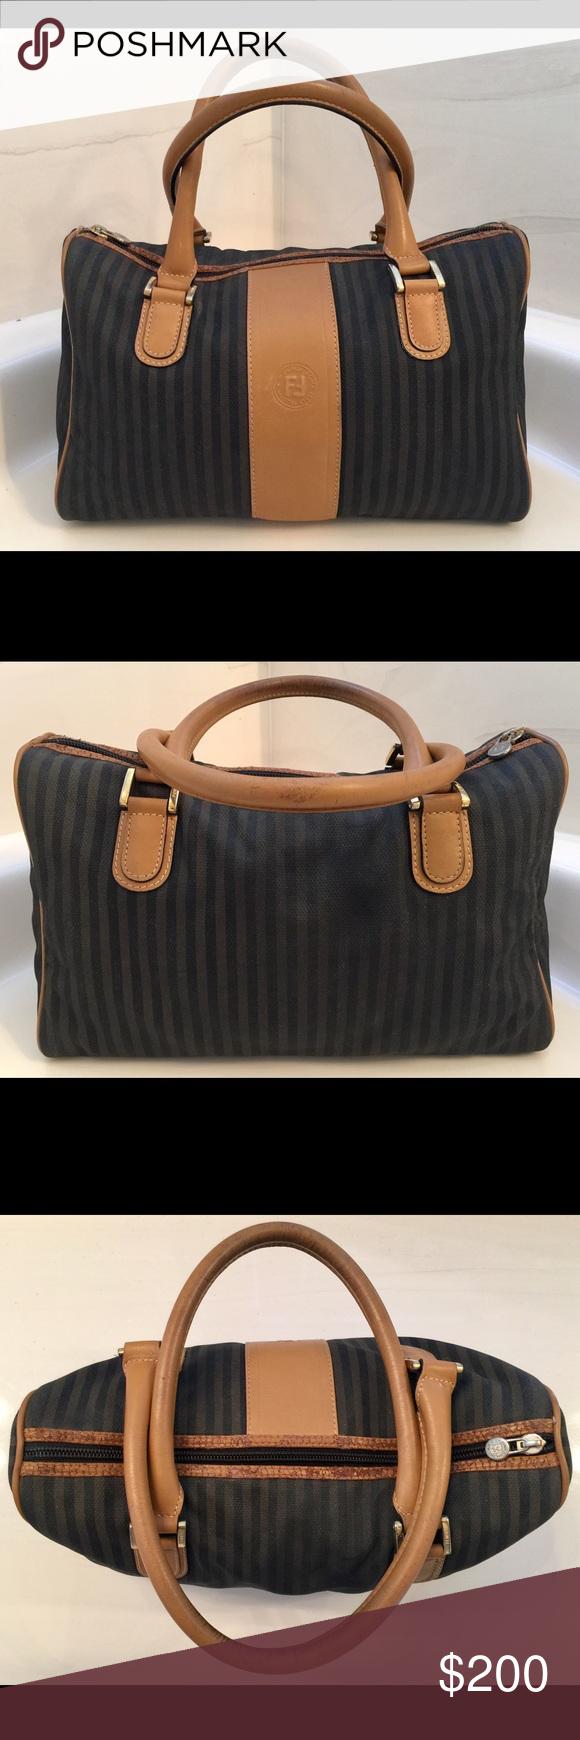 ... shop authentic fendi handbag bowling bag purse bag vintagebefore 1980s  d6cd4 0fd1e ... b559817298